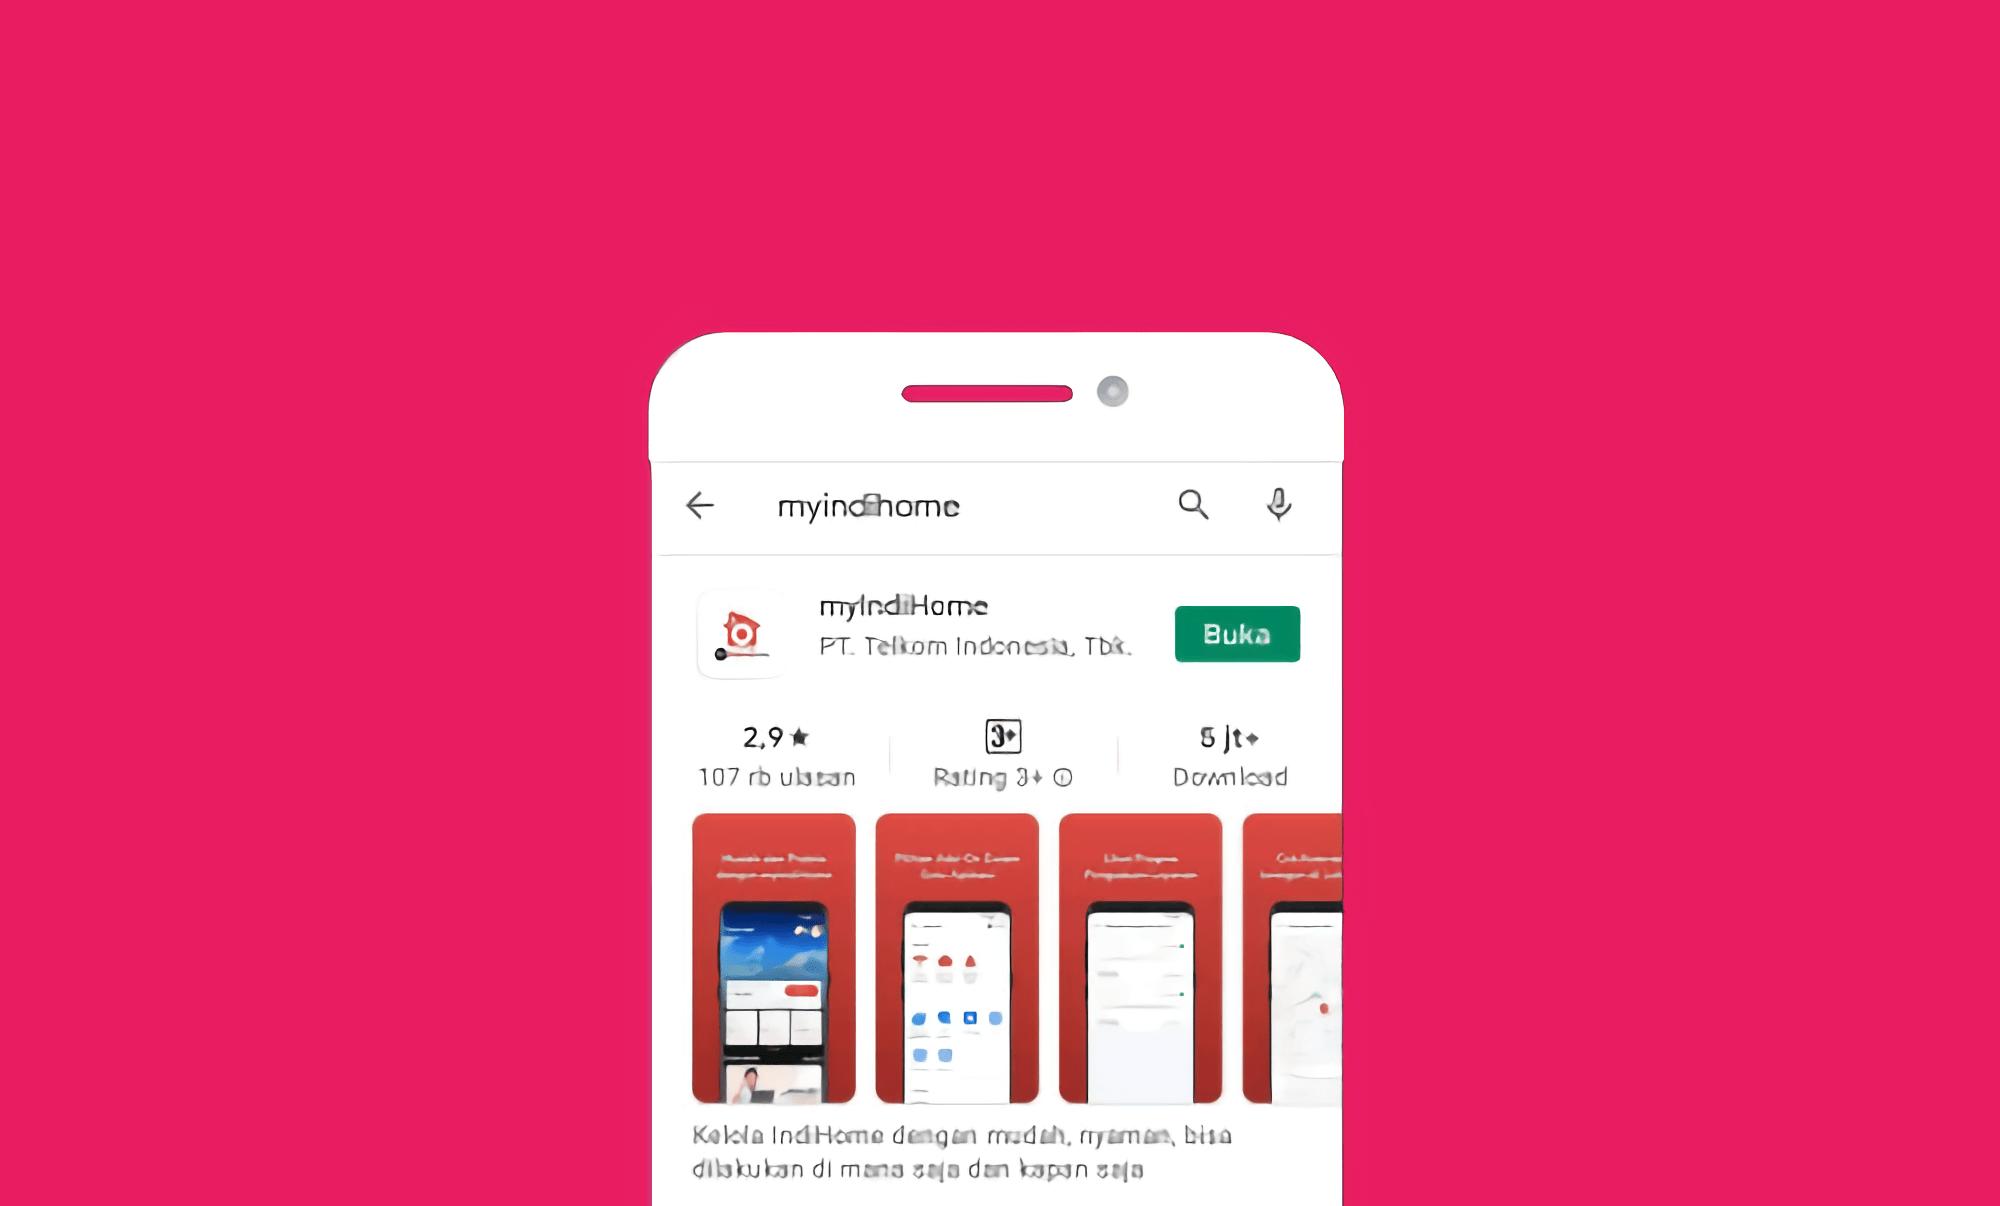 Pengalaman dan Cara Pasang Baru [PSB] Wifi Indihome lewat Aplikasi MyIndihome